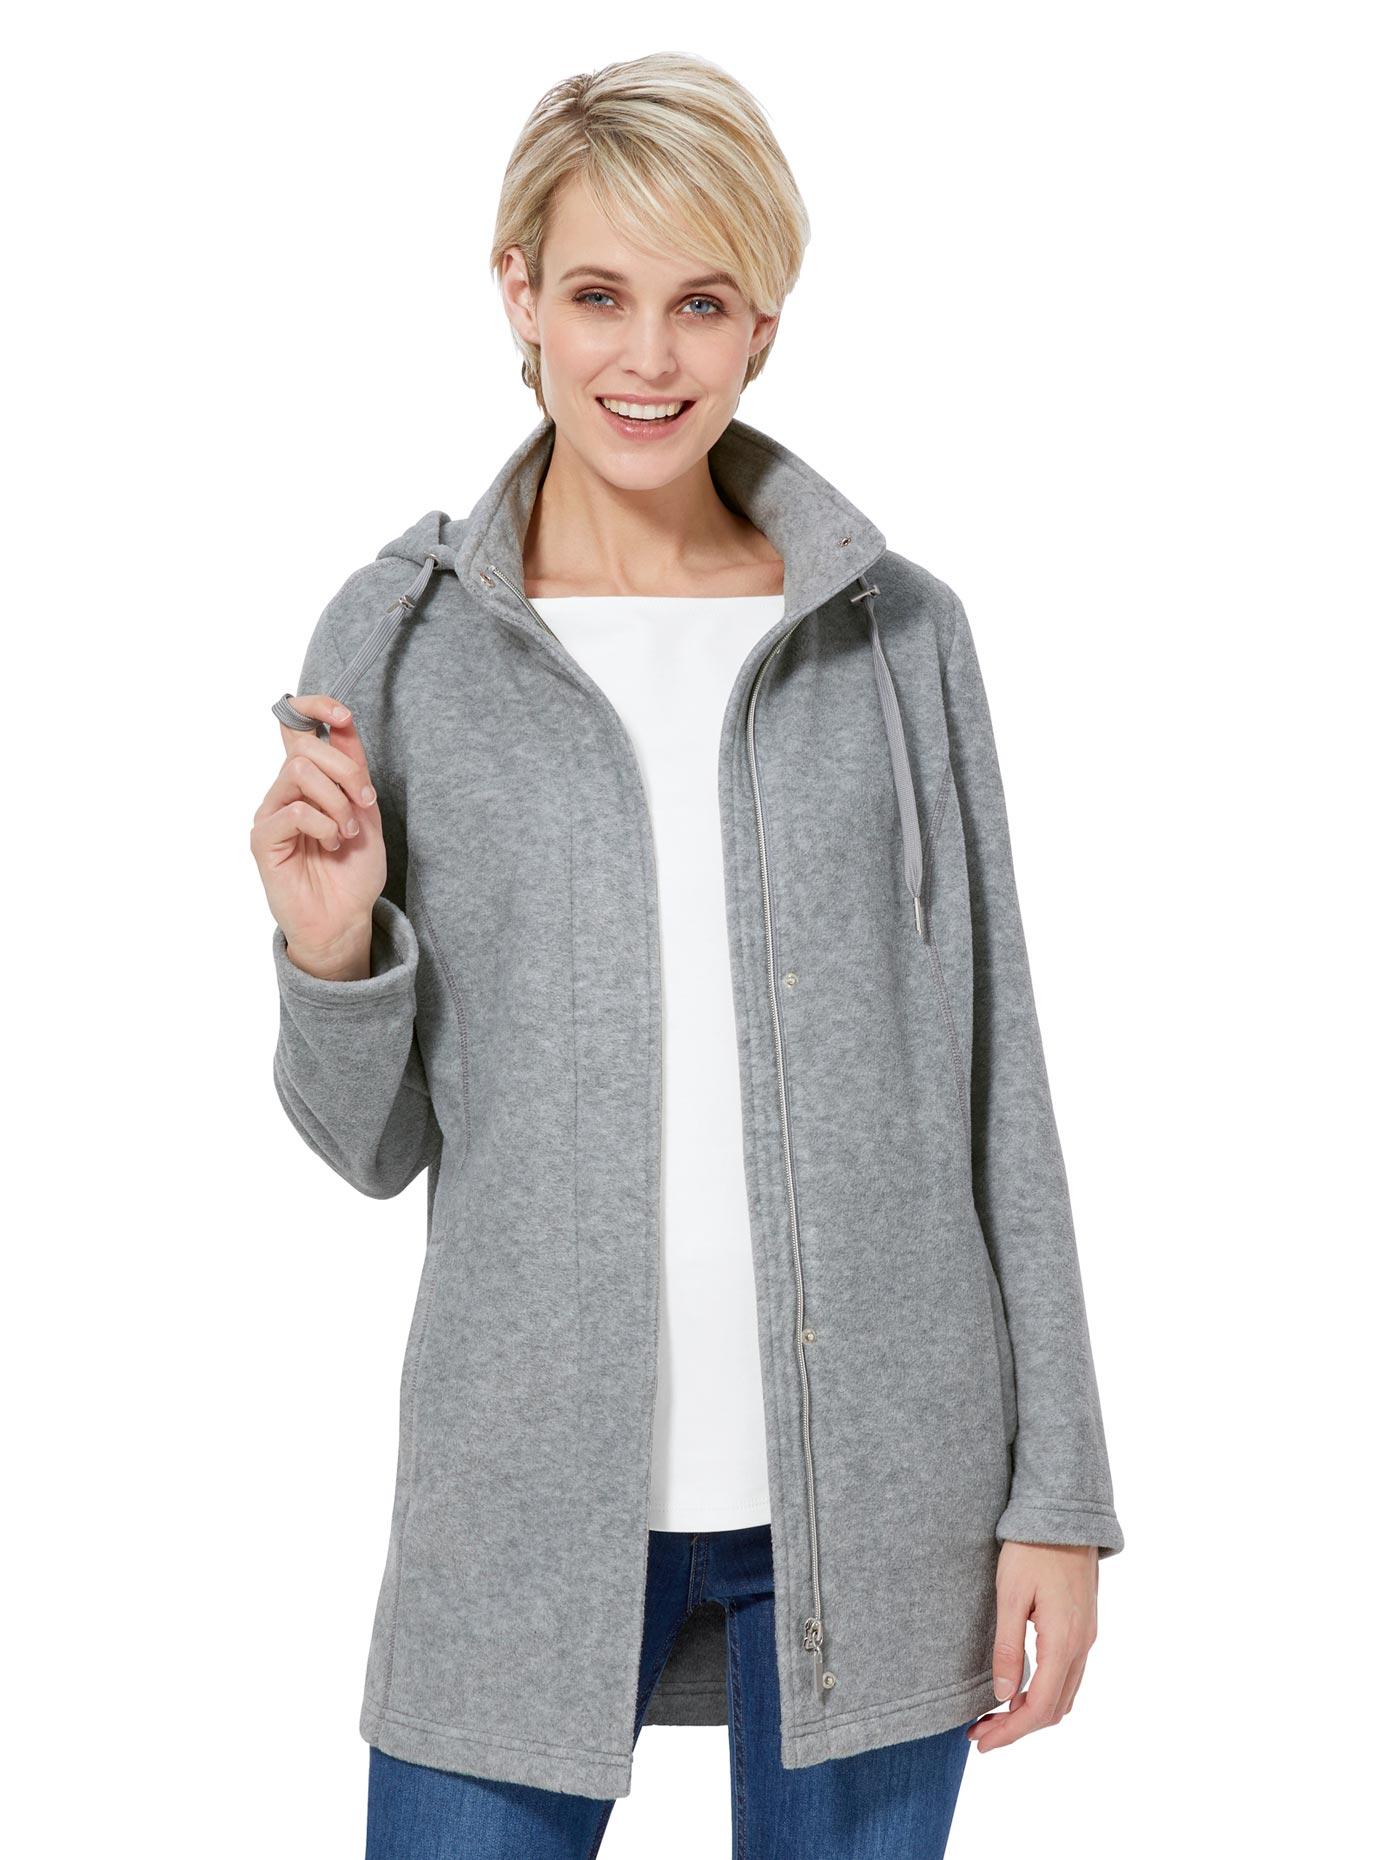 Casual Looks Fleece-Jacke in wärmender Qualität grau Damen Fleecejacken Jacken Mäntel Jacken, lang